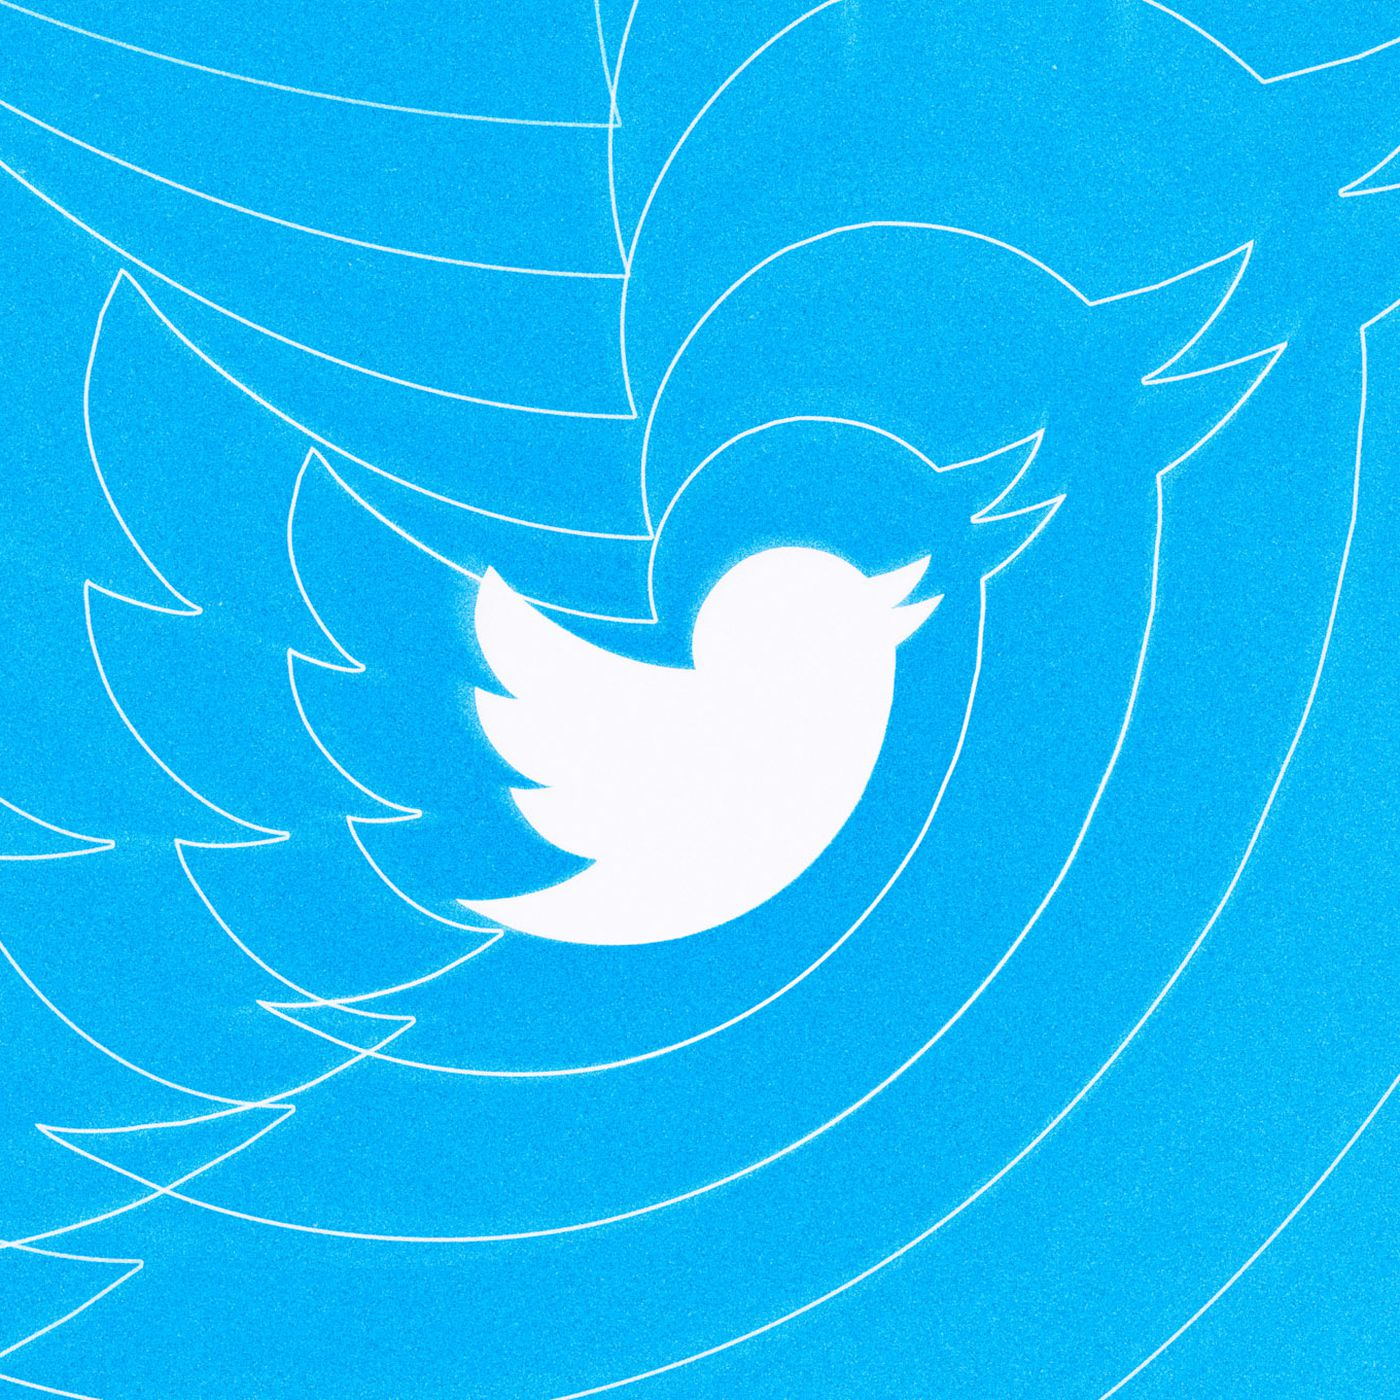 Twitter Won T Punish Alex Jones For His Past Twitter Behavior The